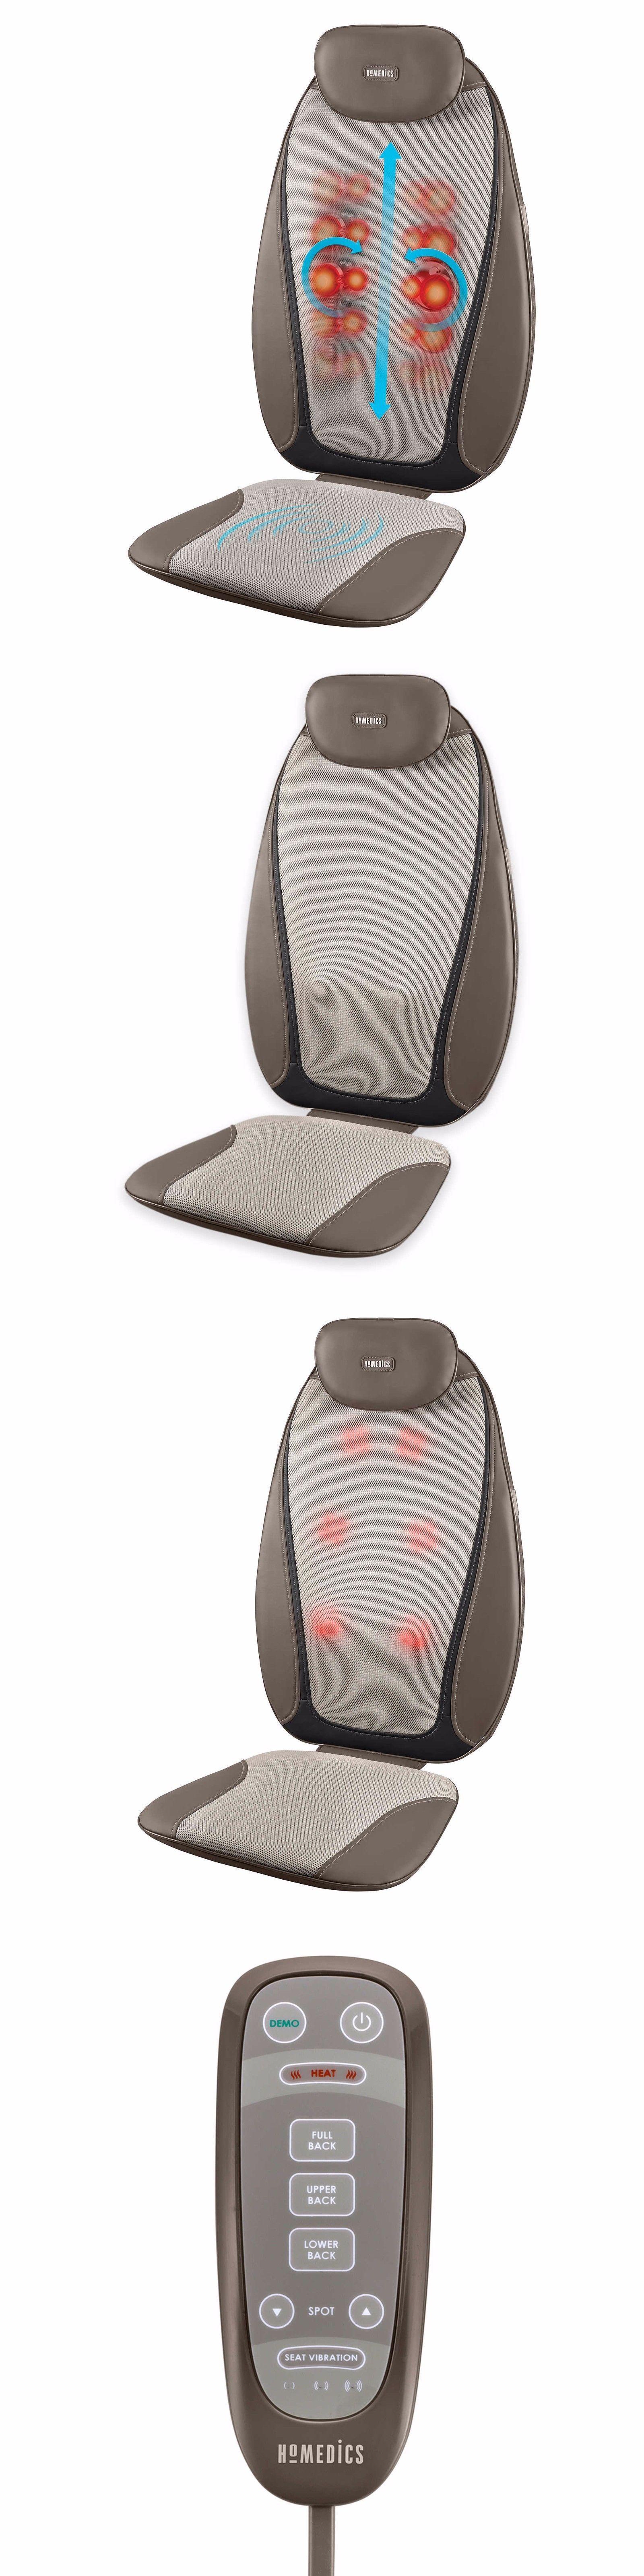 Electric Massage Chairs Homedics Dual Shiatsu Pro Plus Back